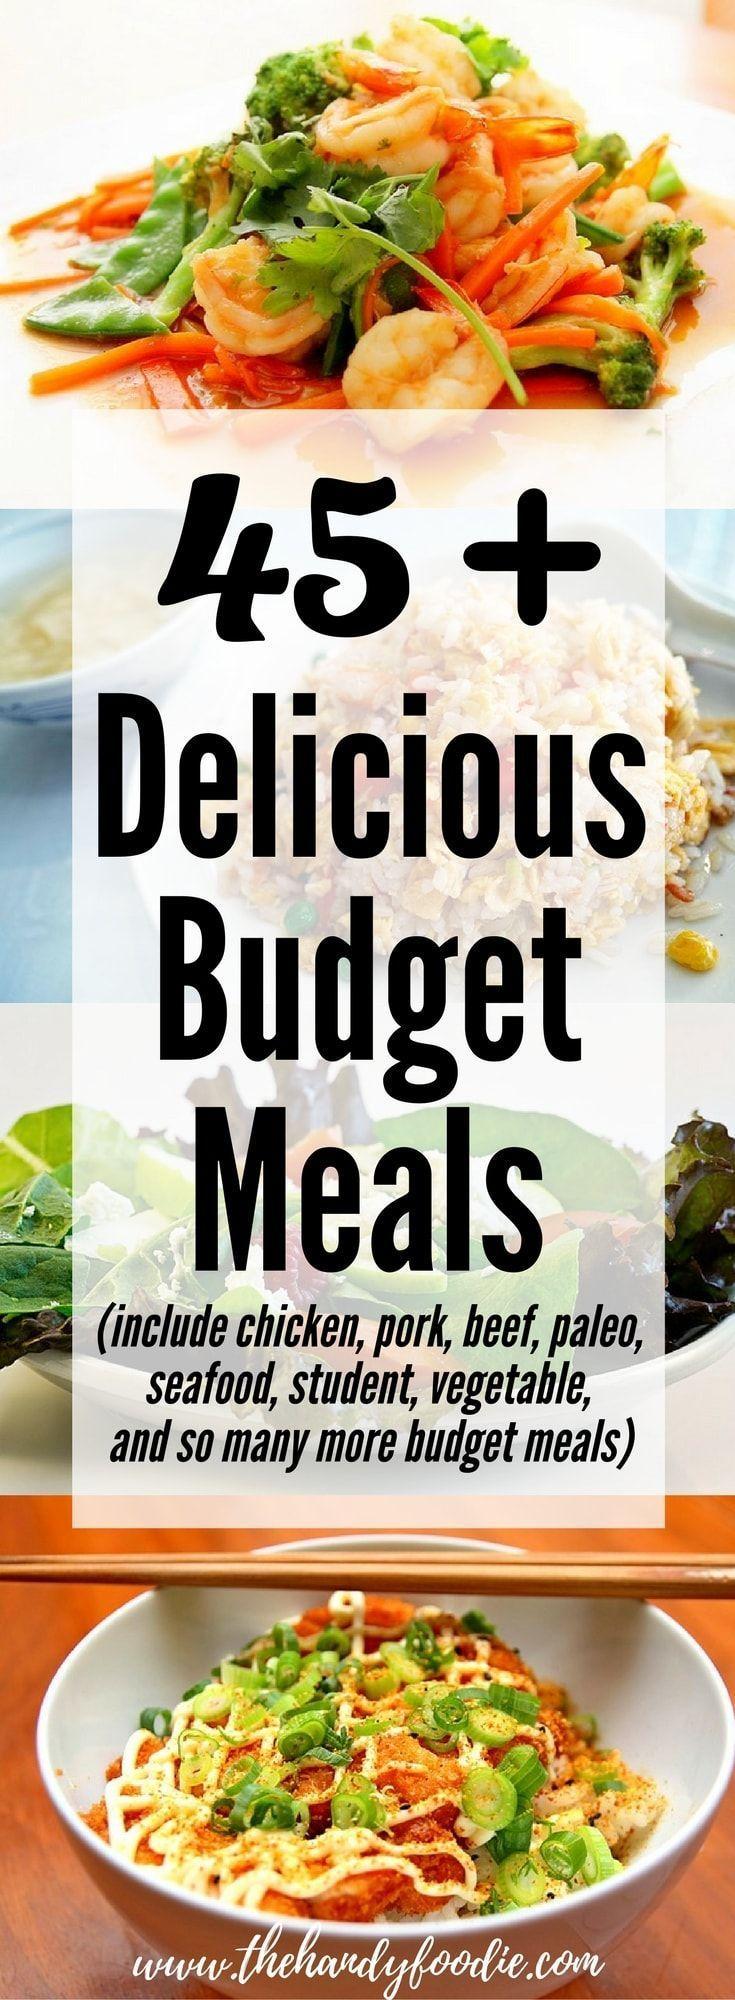 45+ Delicious Budget Meals . chicken l pork l beef l paleo l seafood l student budget l Mediterranean l soup l vegetable l healthy l yummy l best meals l easy recipe